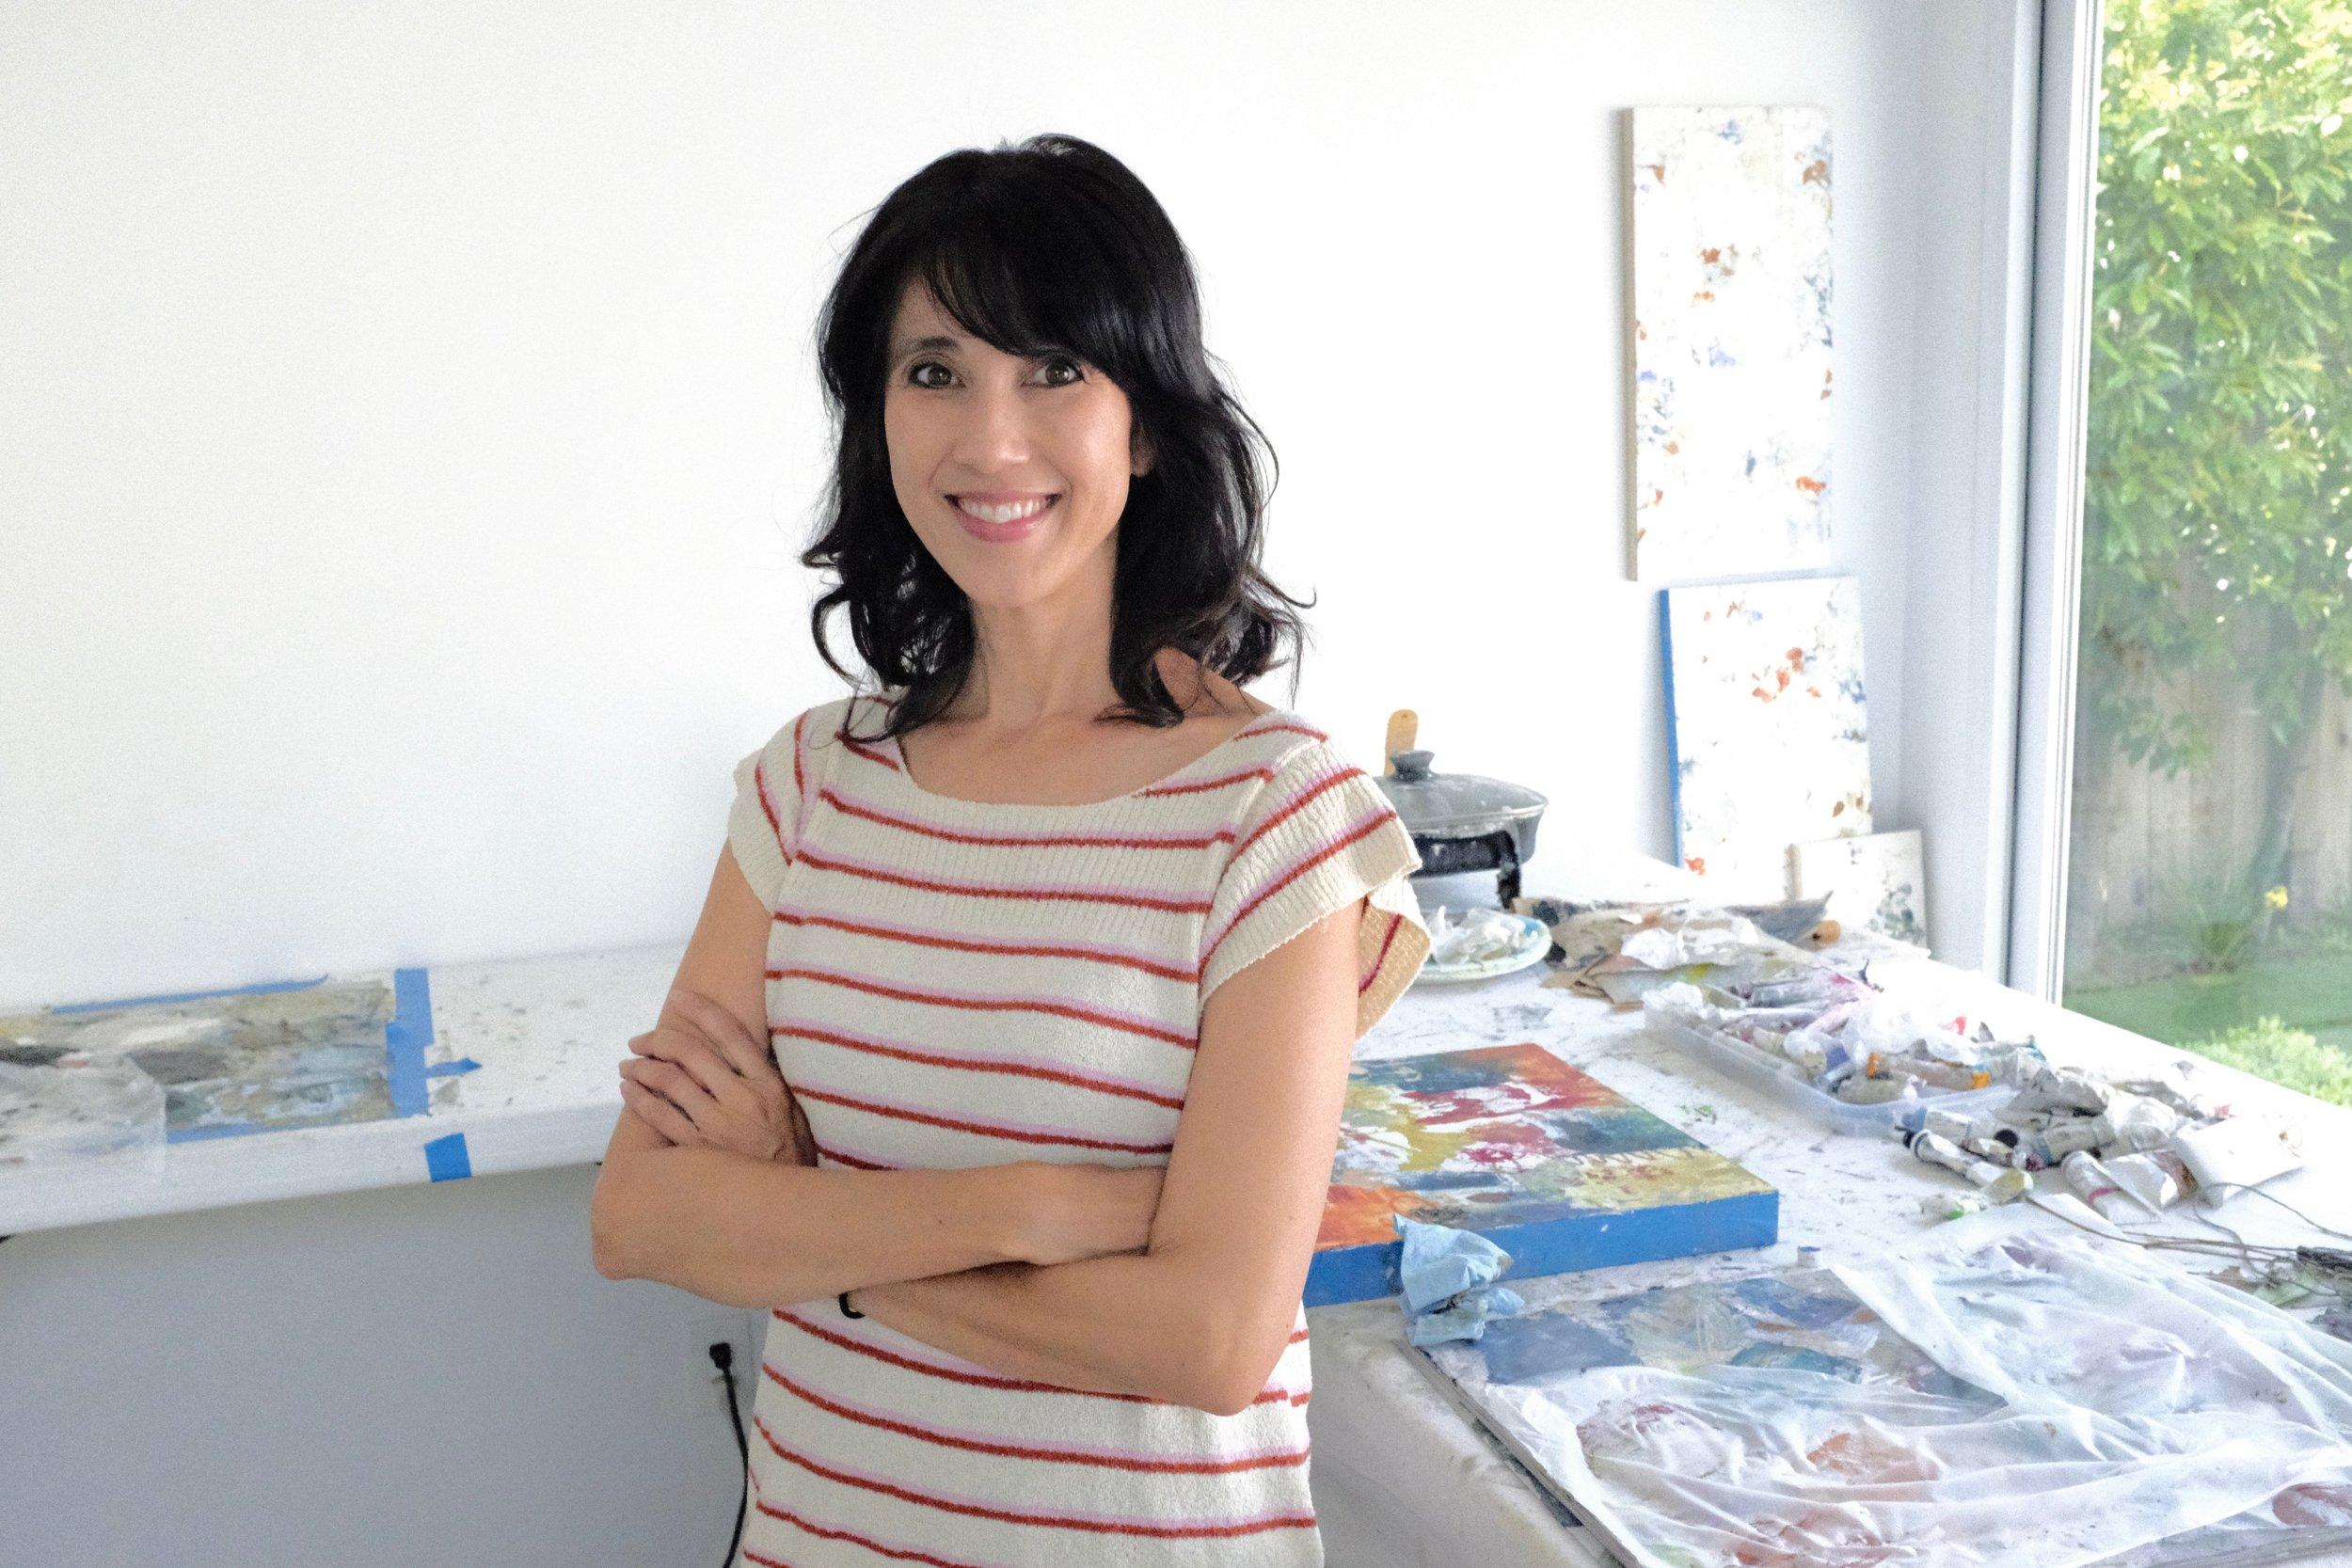 Sali Swalla in her studio